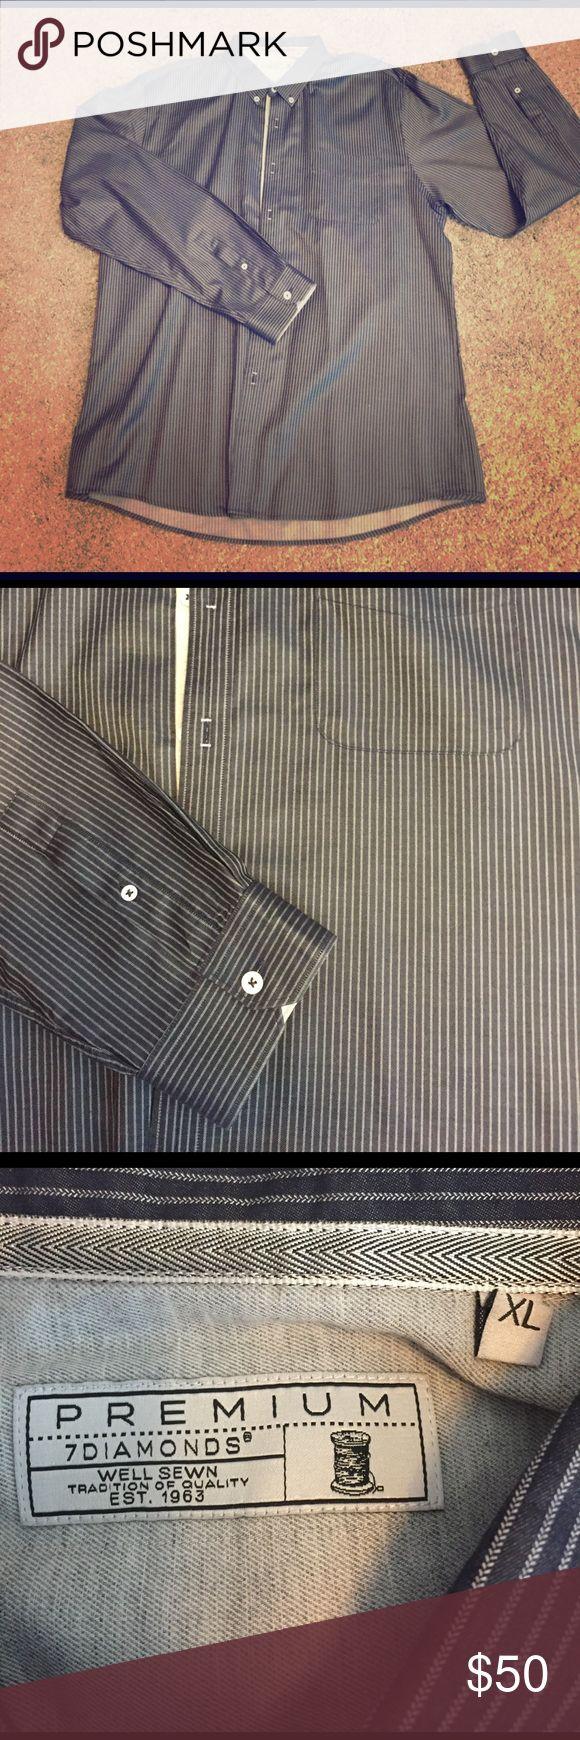 7 Diamonds Premium Mens Dress Shirt XL. 7 Diamonds Premium men's dress shirt. Like new. Dark blue with white pin stripes. 7 Diamonds Shirts Dress Shirts